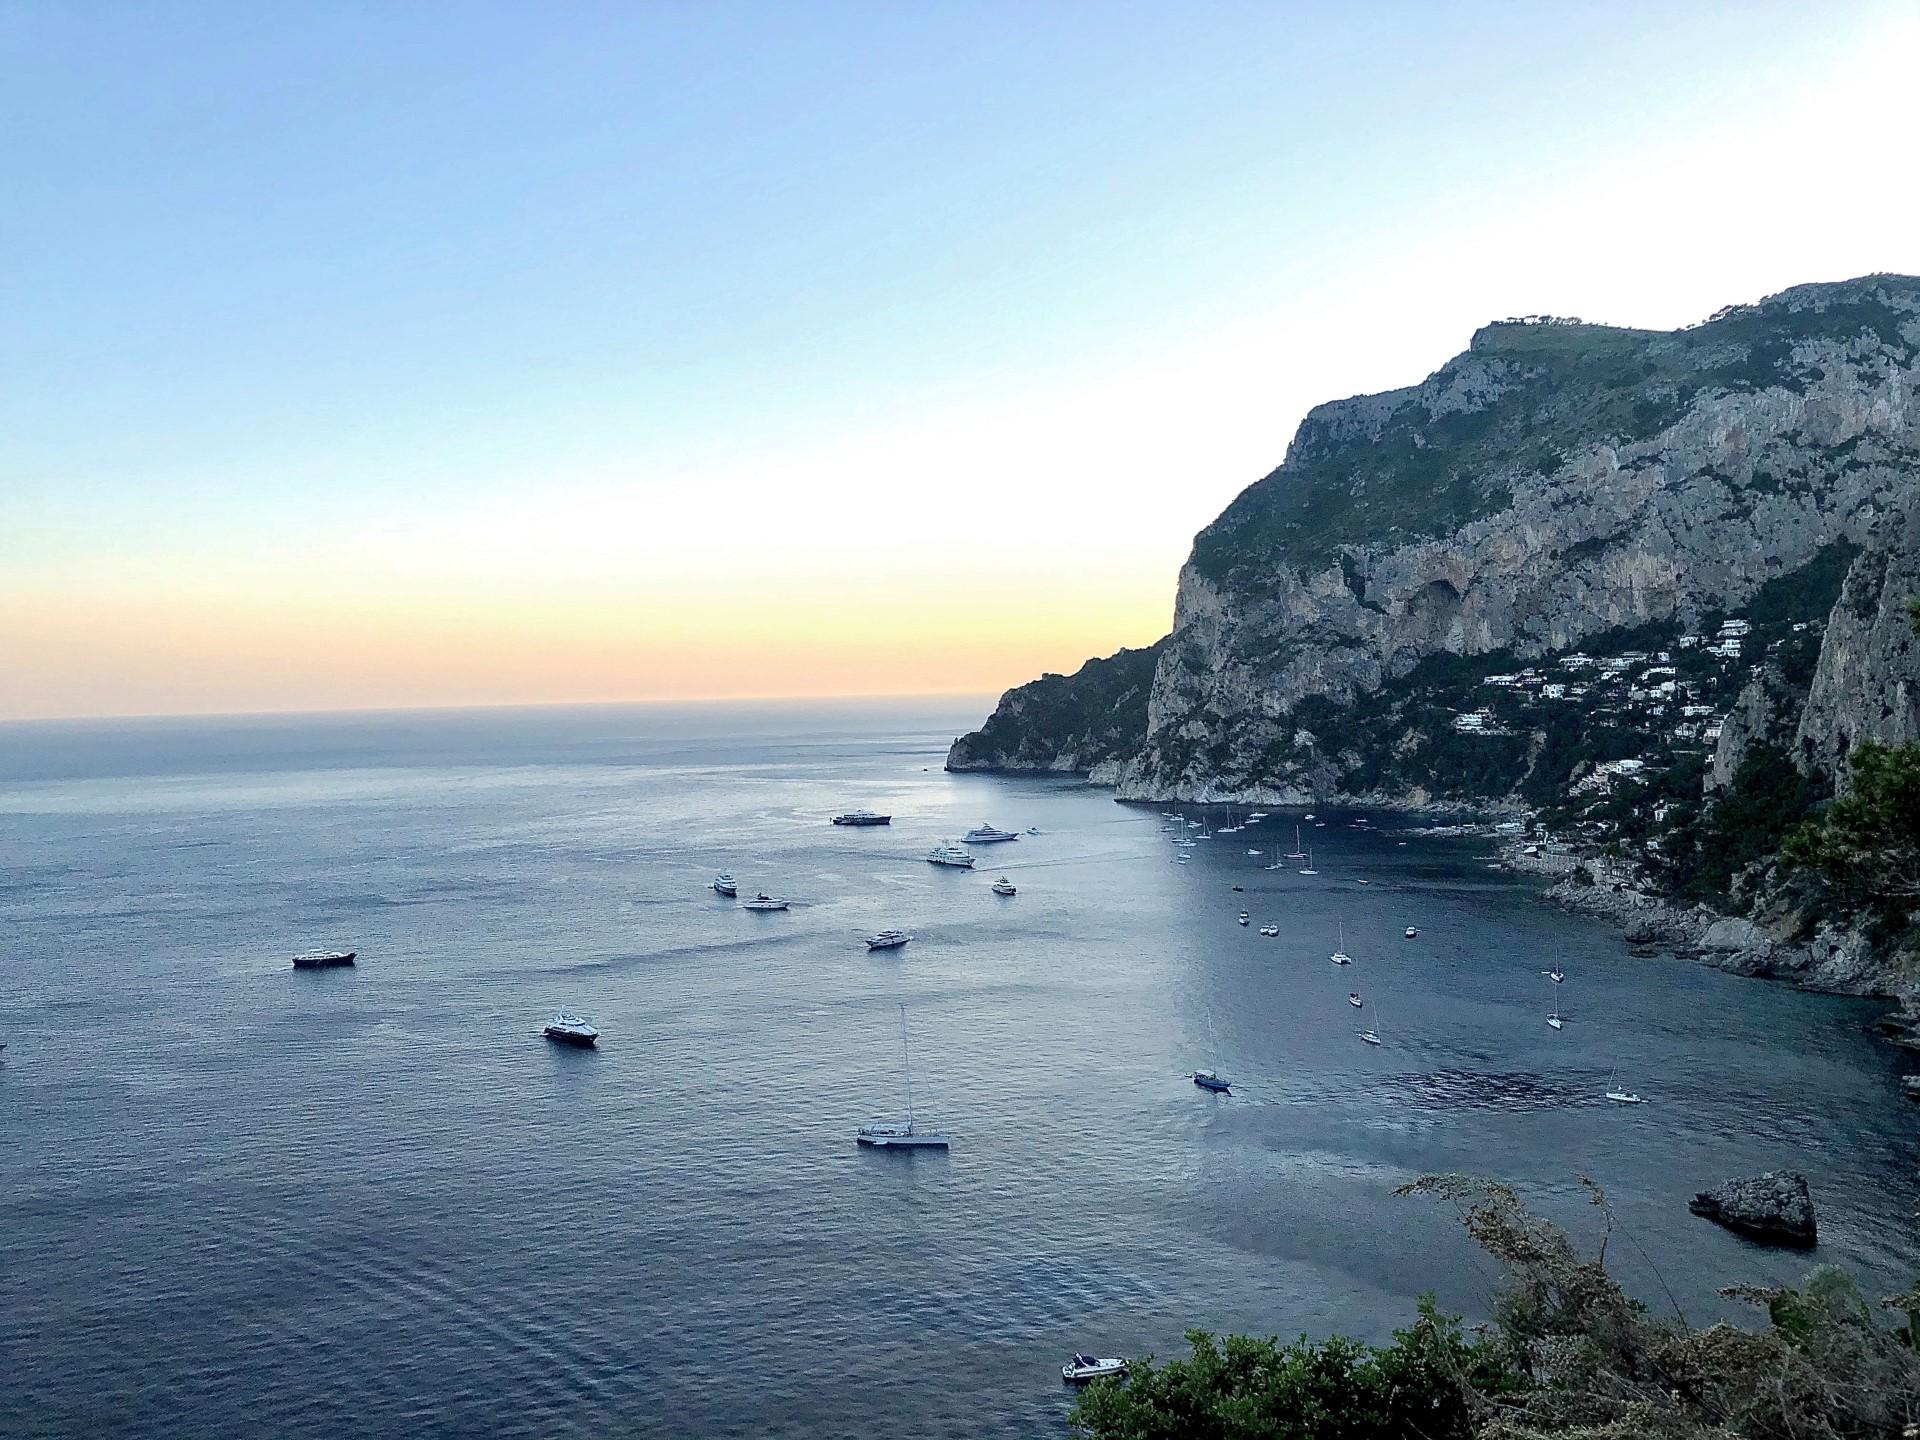 Vista, Le Monzù, Capri